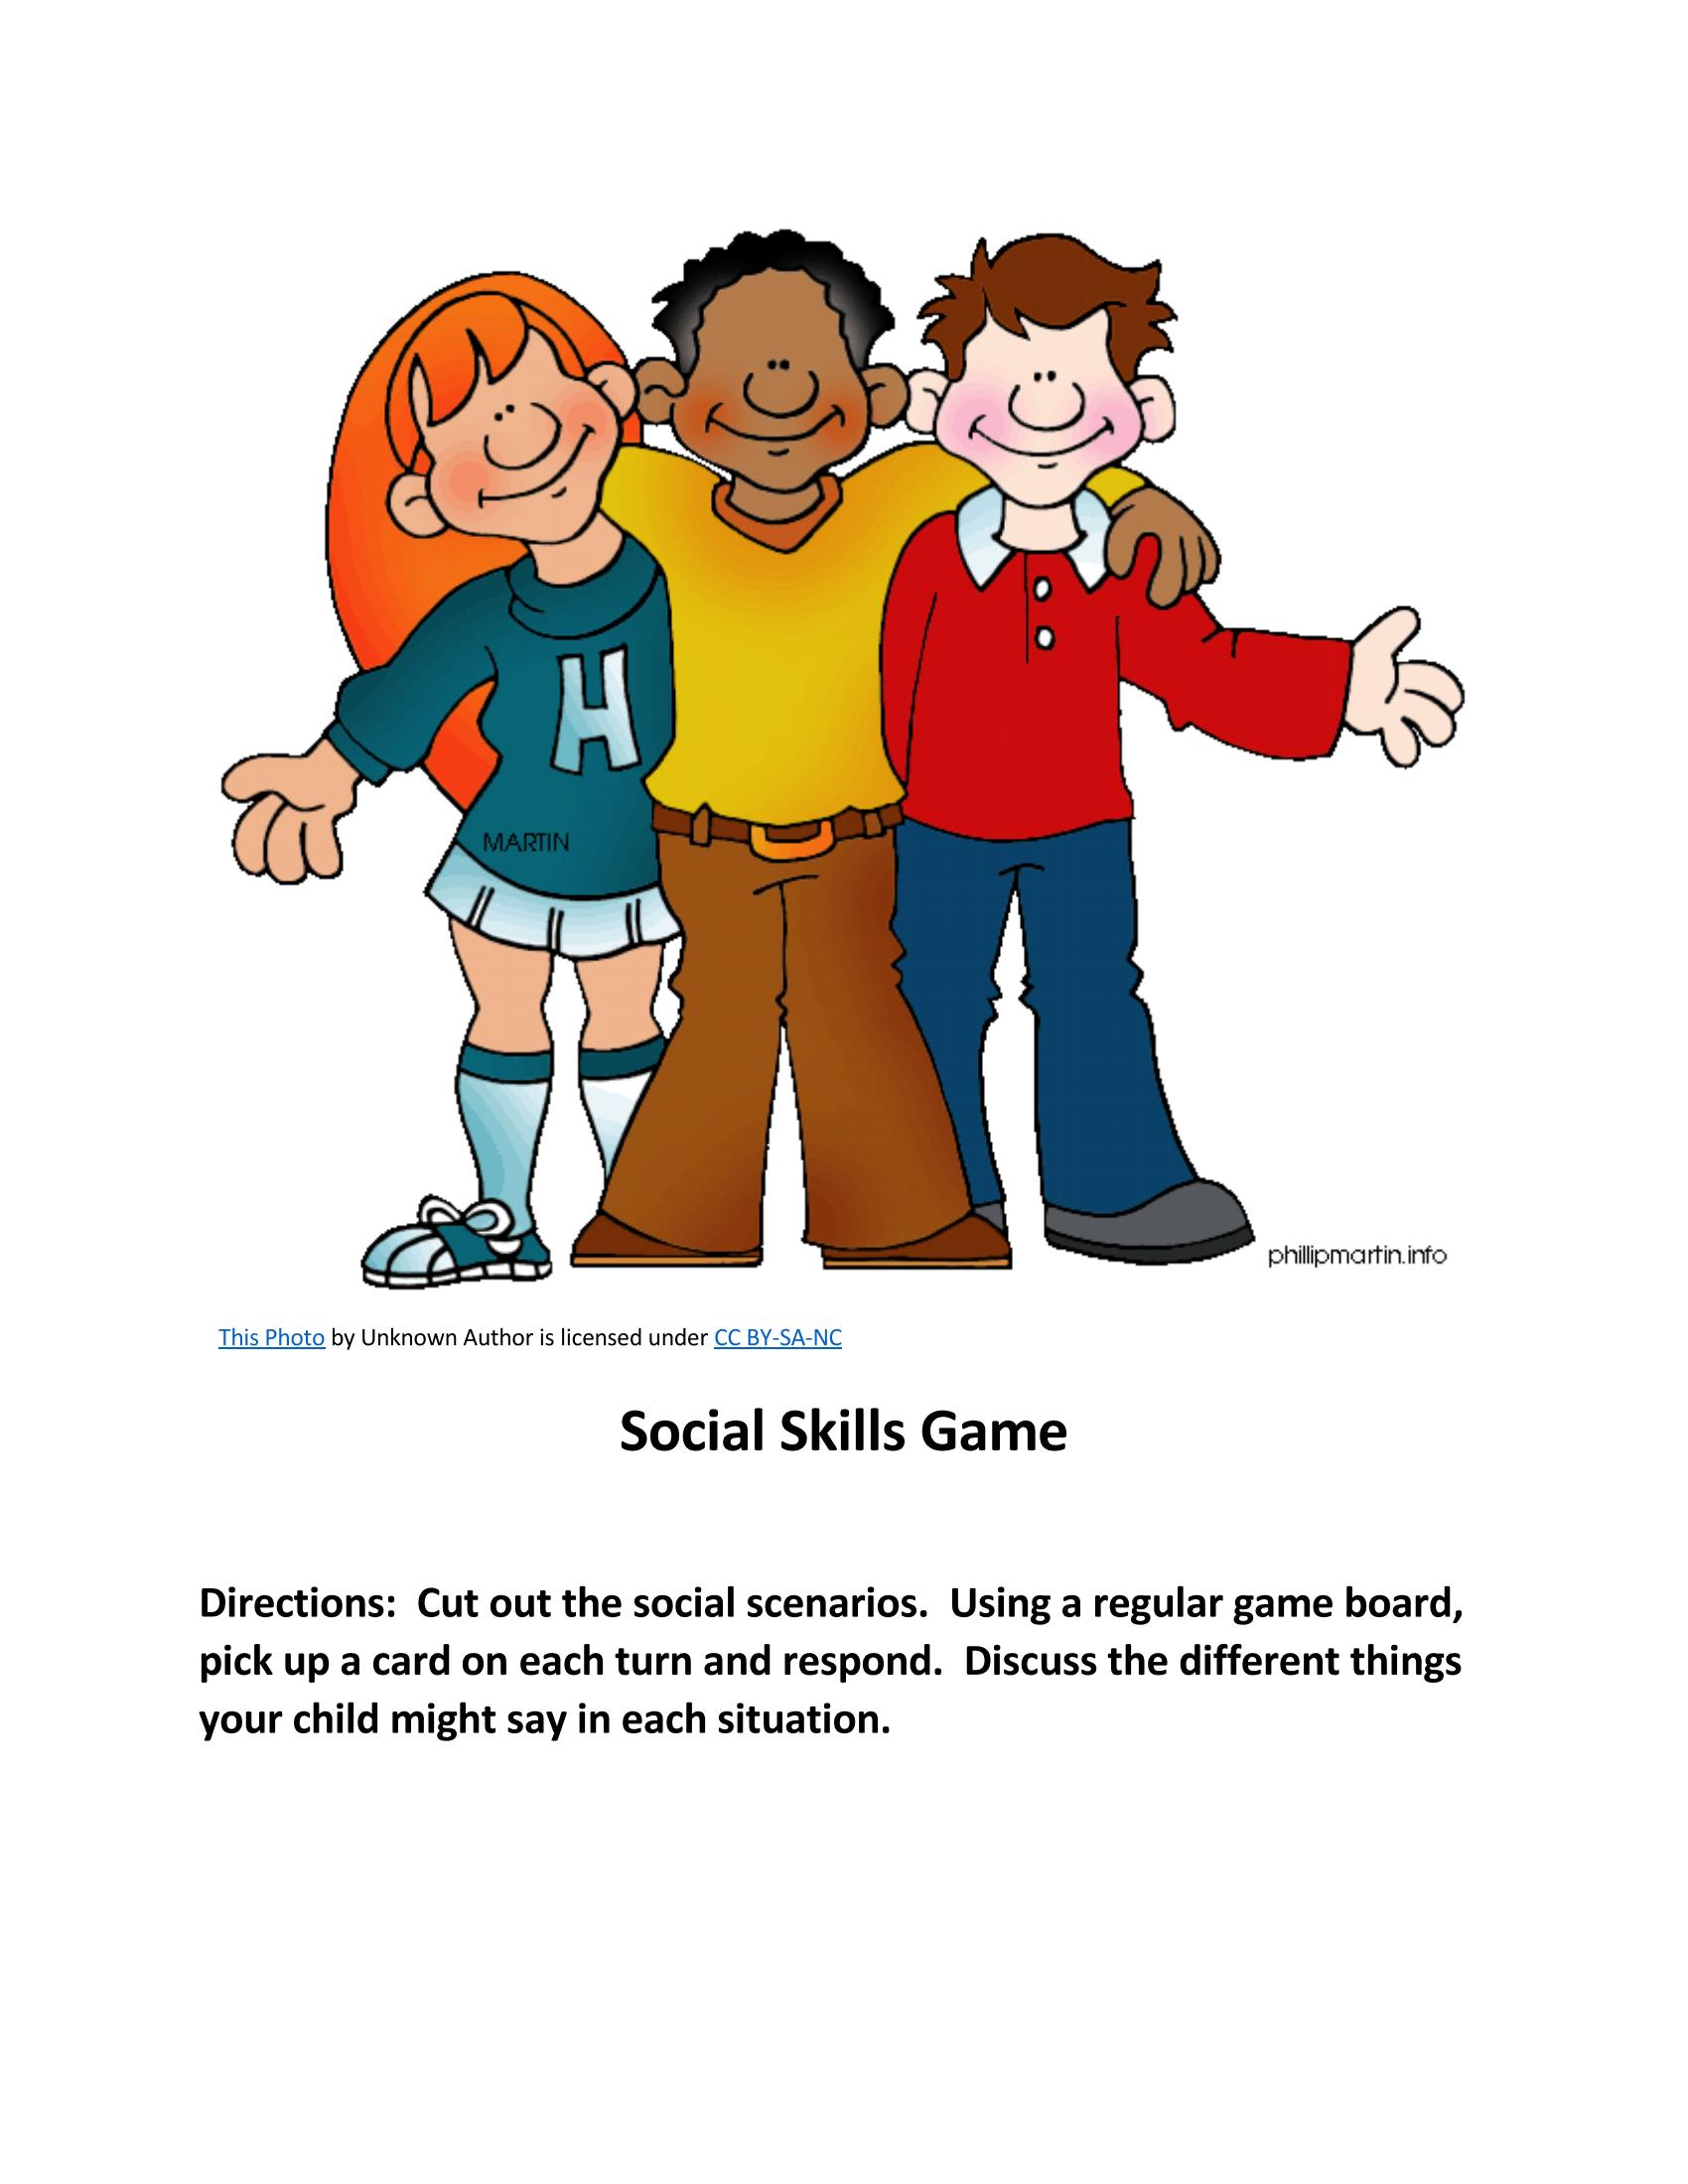 Social Skills Game